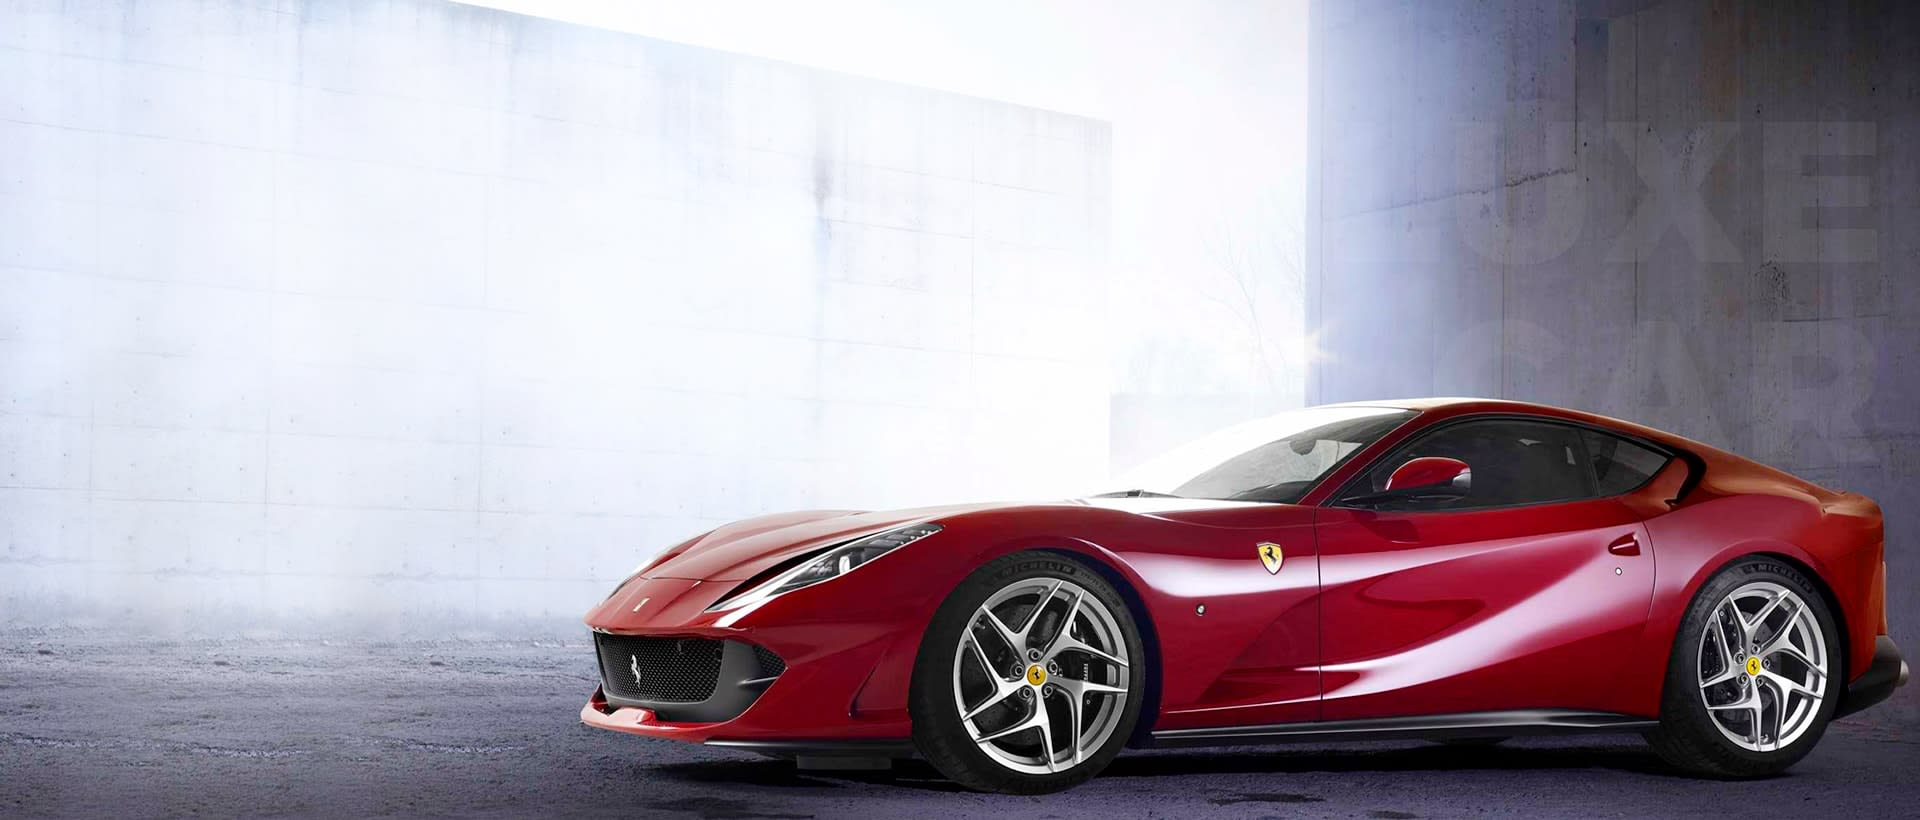 Luxury Car Rental In Europe Hire Sport Cars Premium Sedan Luxury Convertible